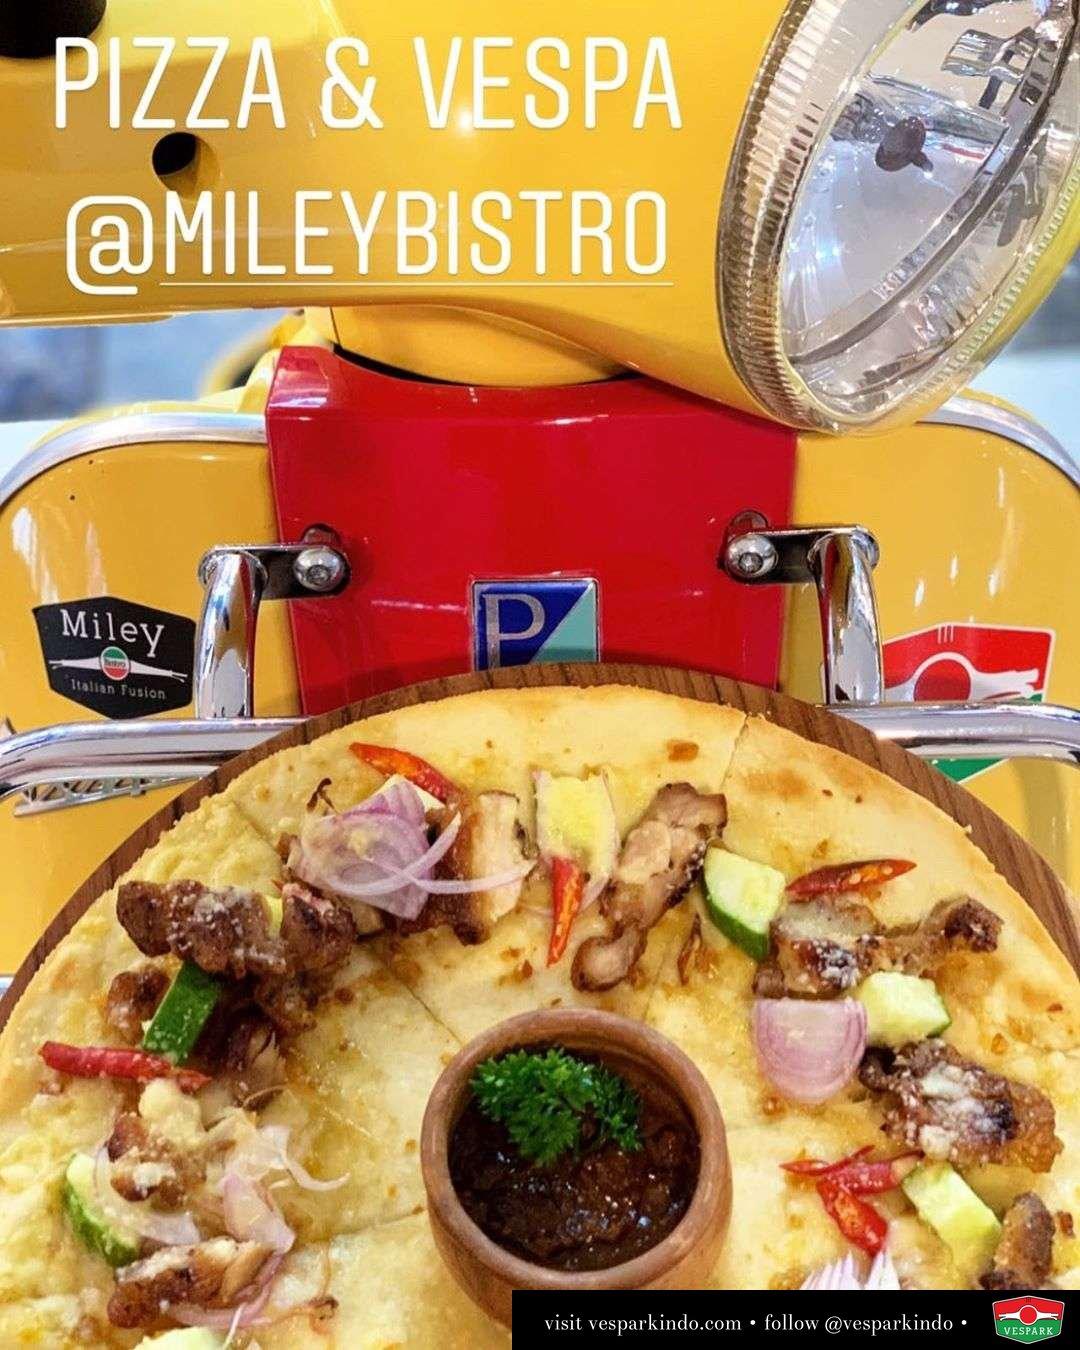 Pizza & Vespa LX sidecar  @MileyBistro